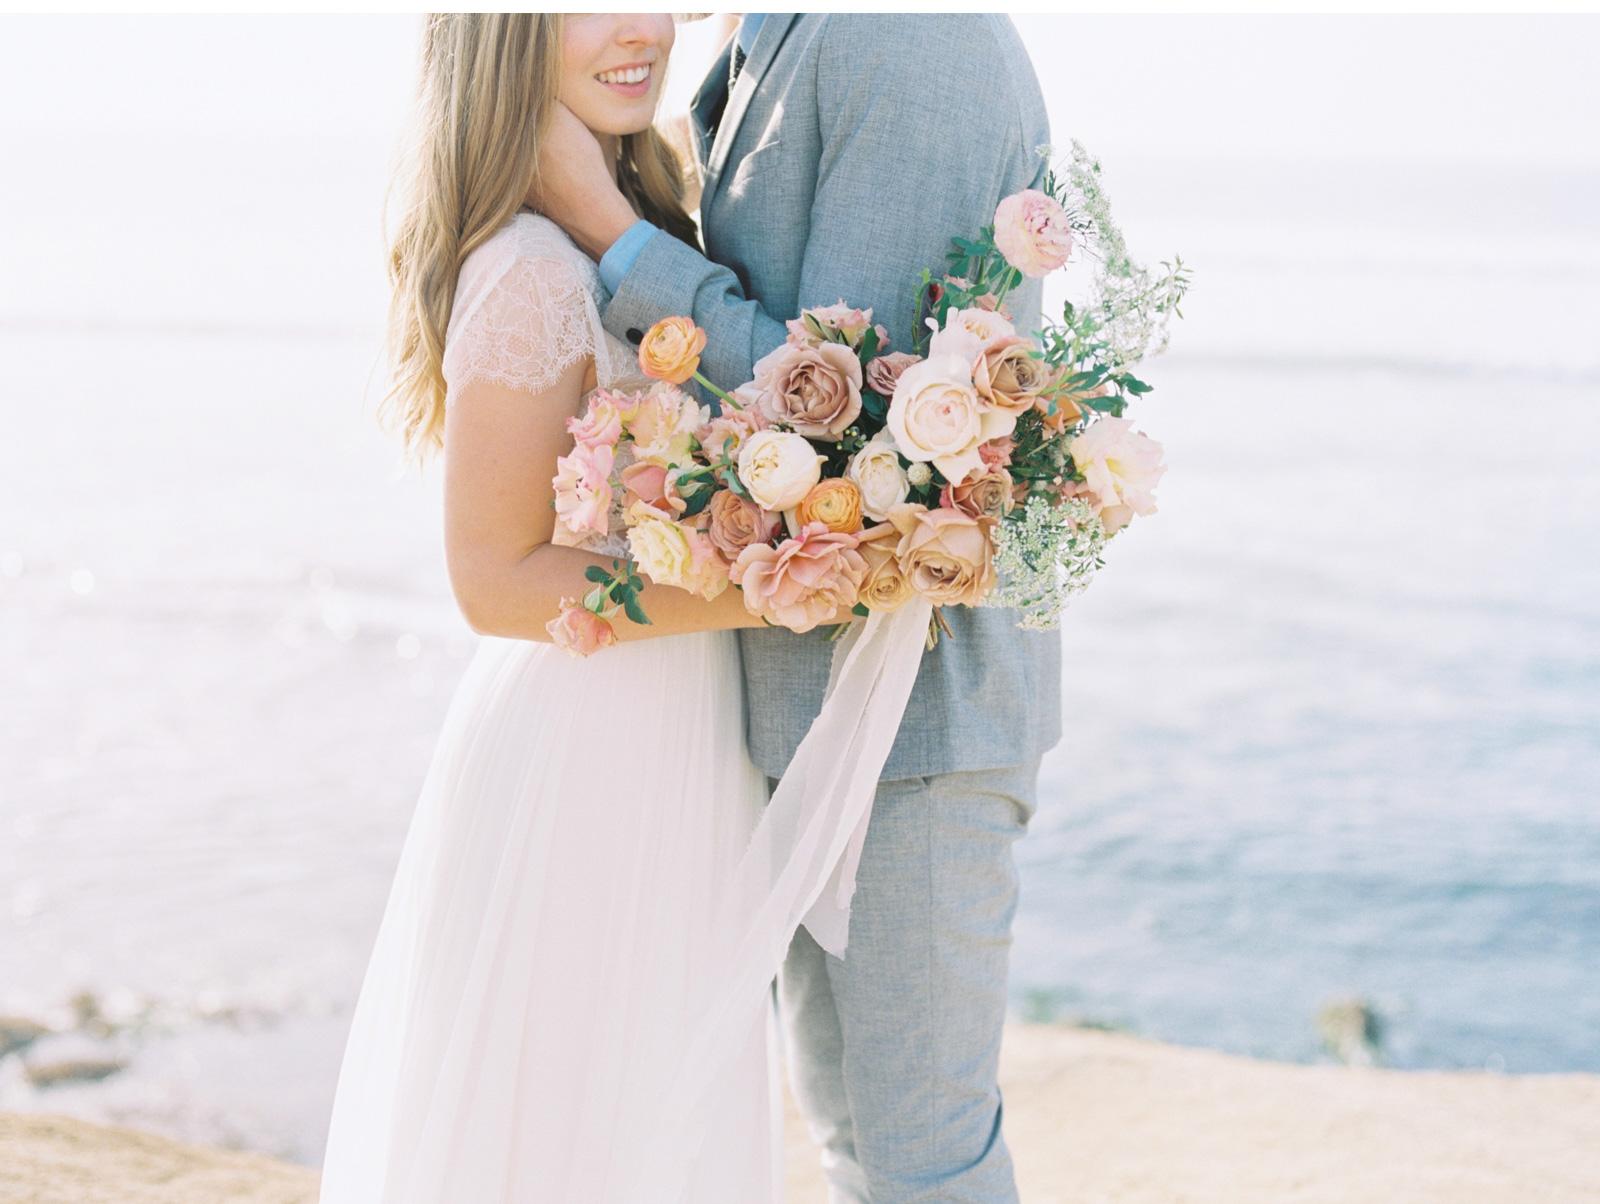 Style-Me-Pretty-California-Beach-Wedding-Natalie-Schutt-Photography_14.jpg